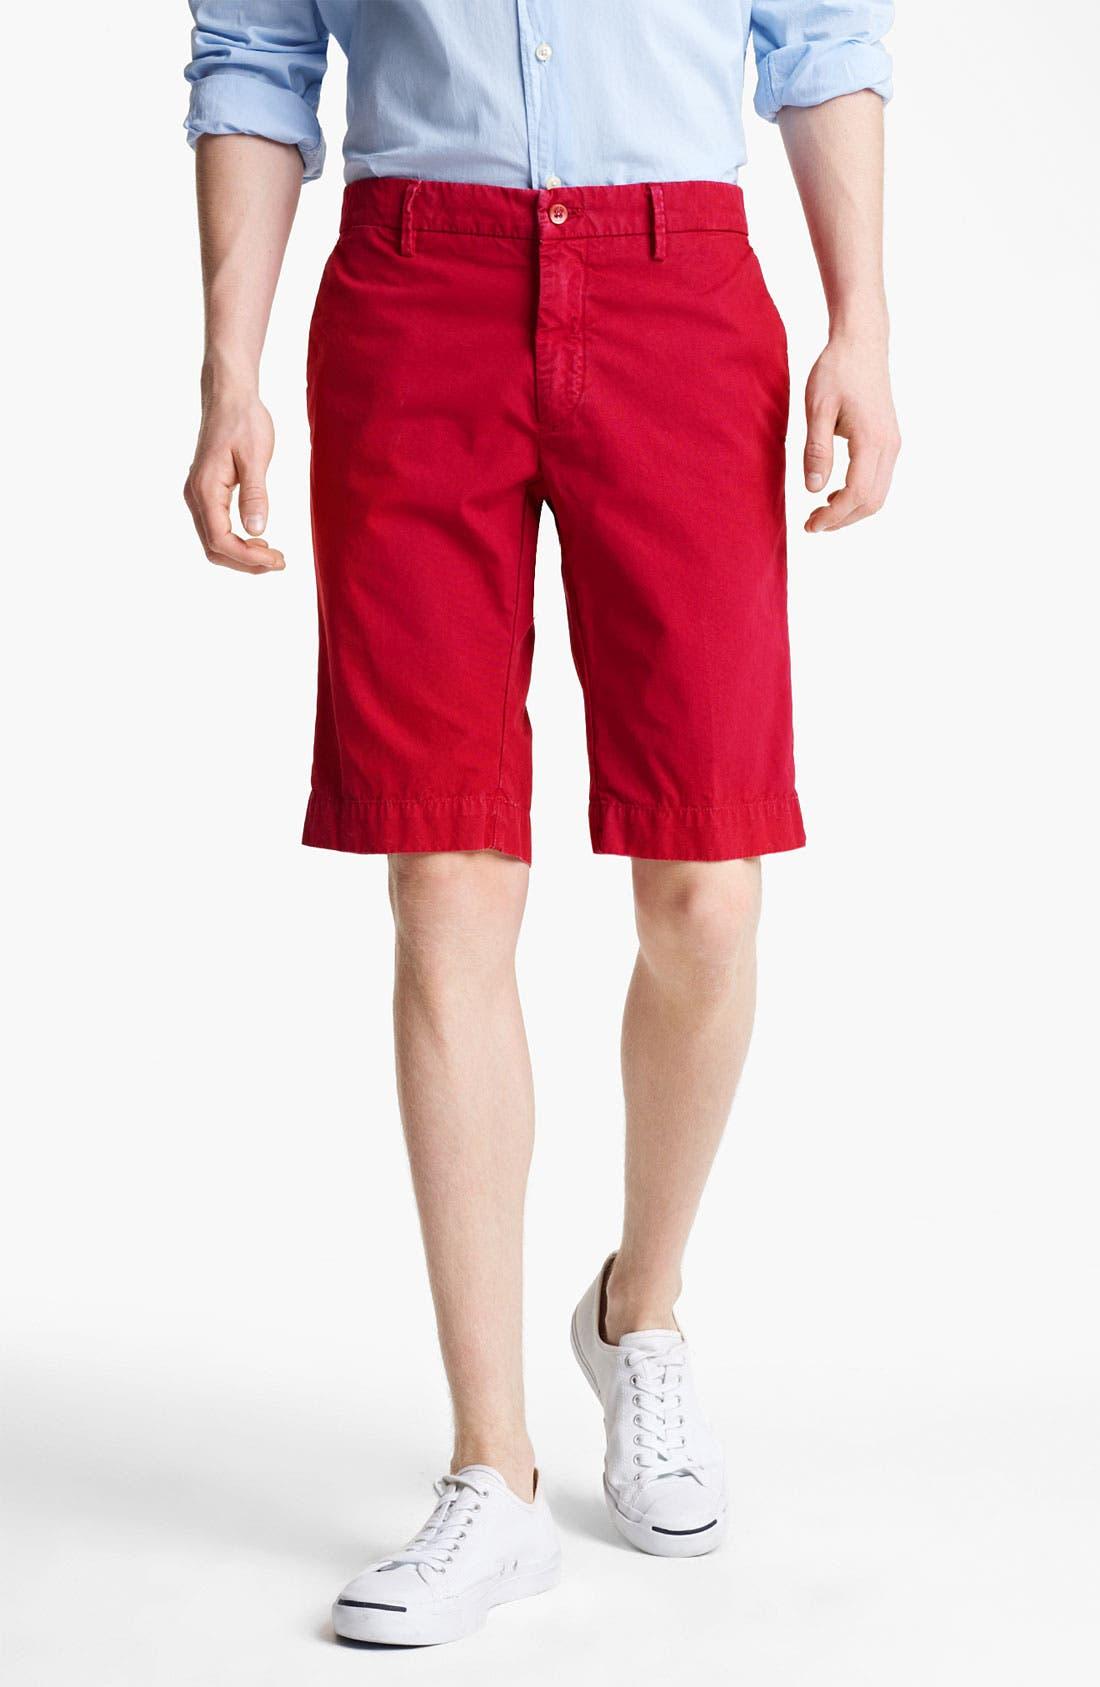 Main Image - Mason's New York Fit Cotton Shorts